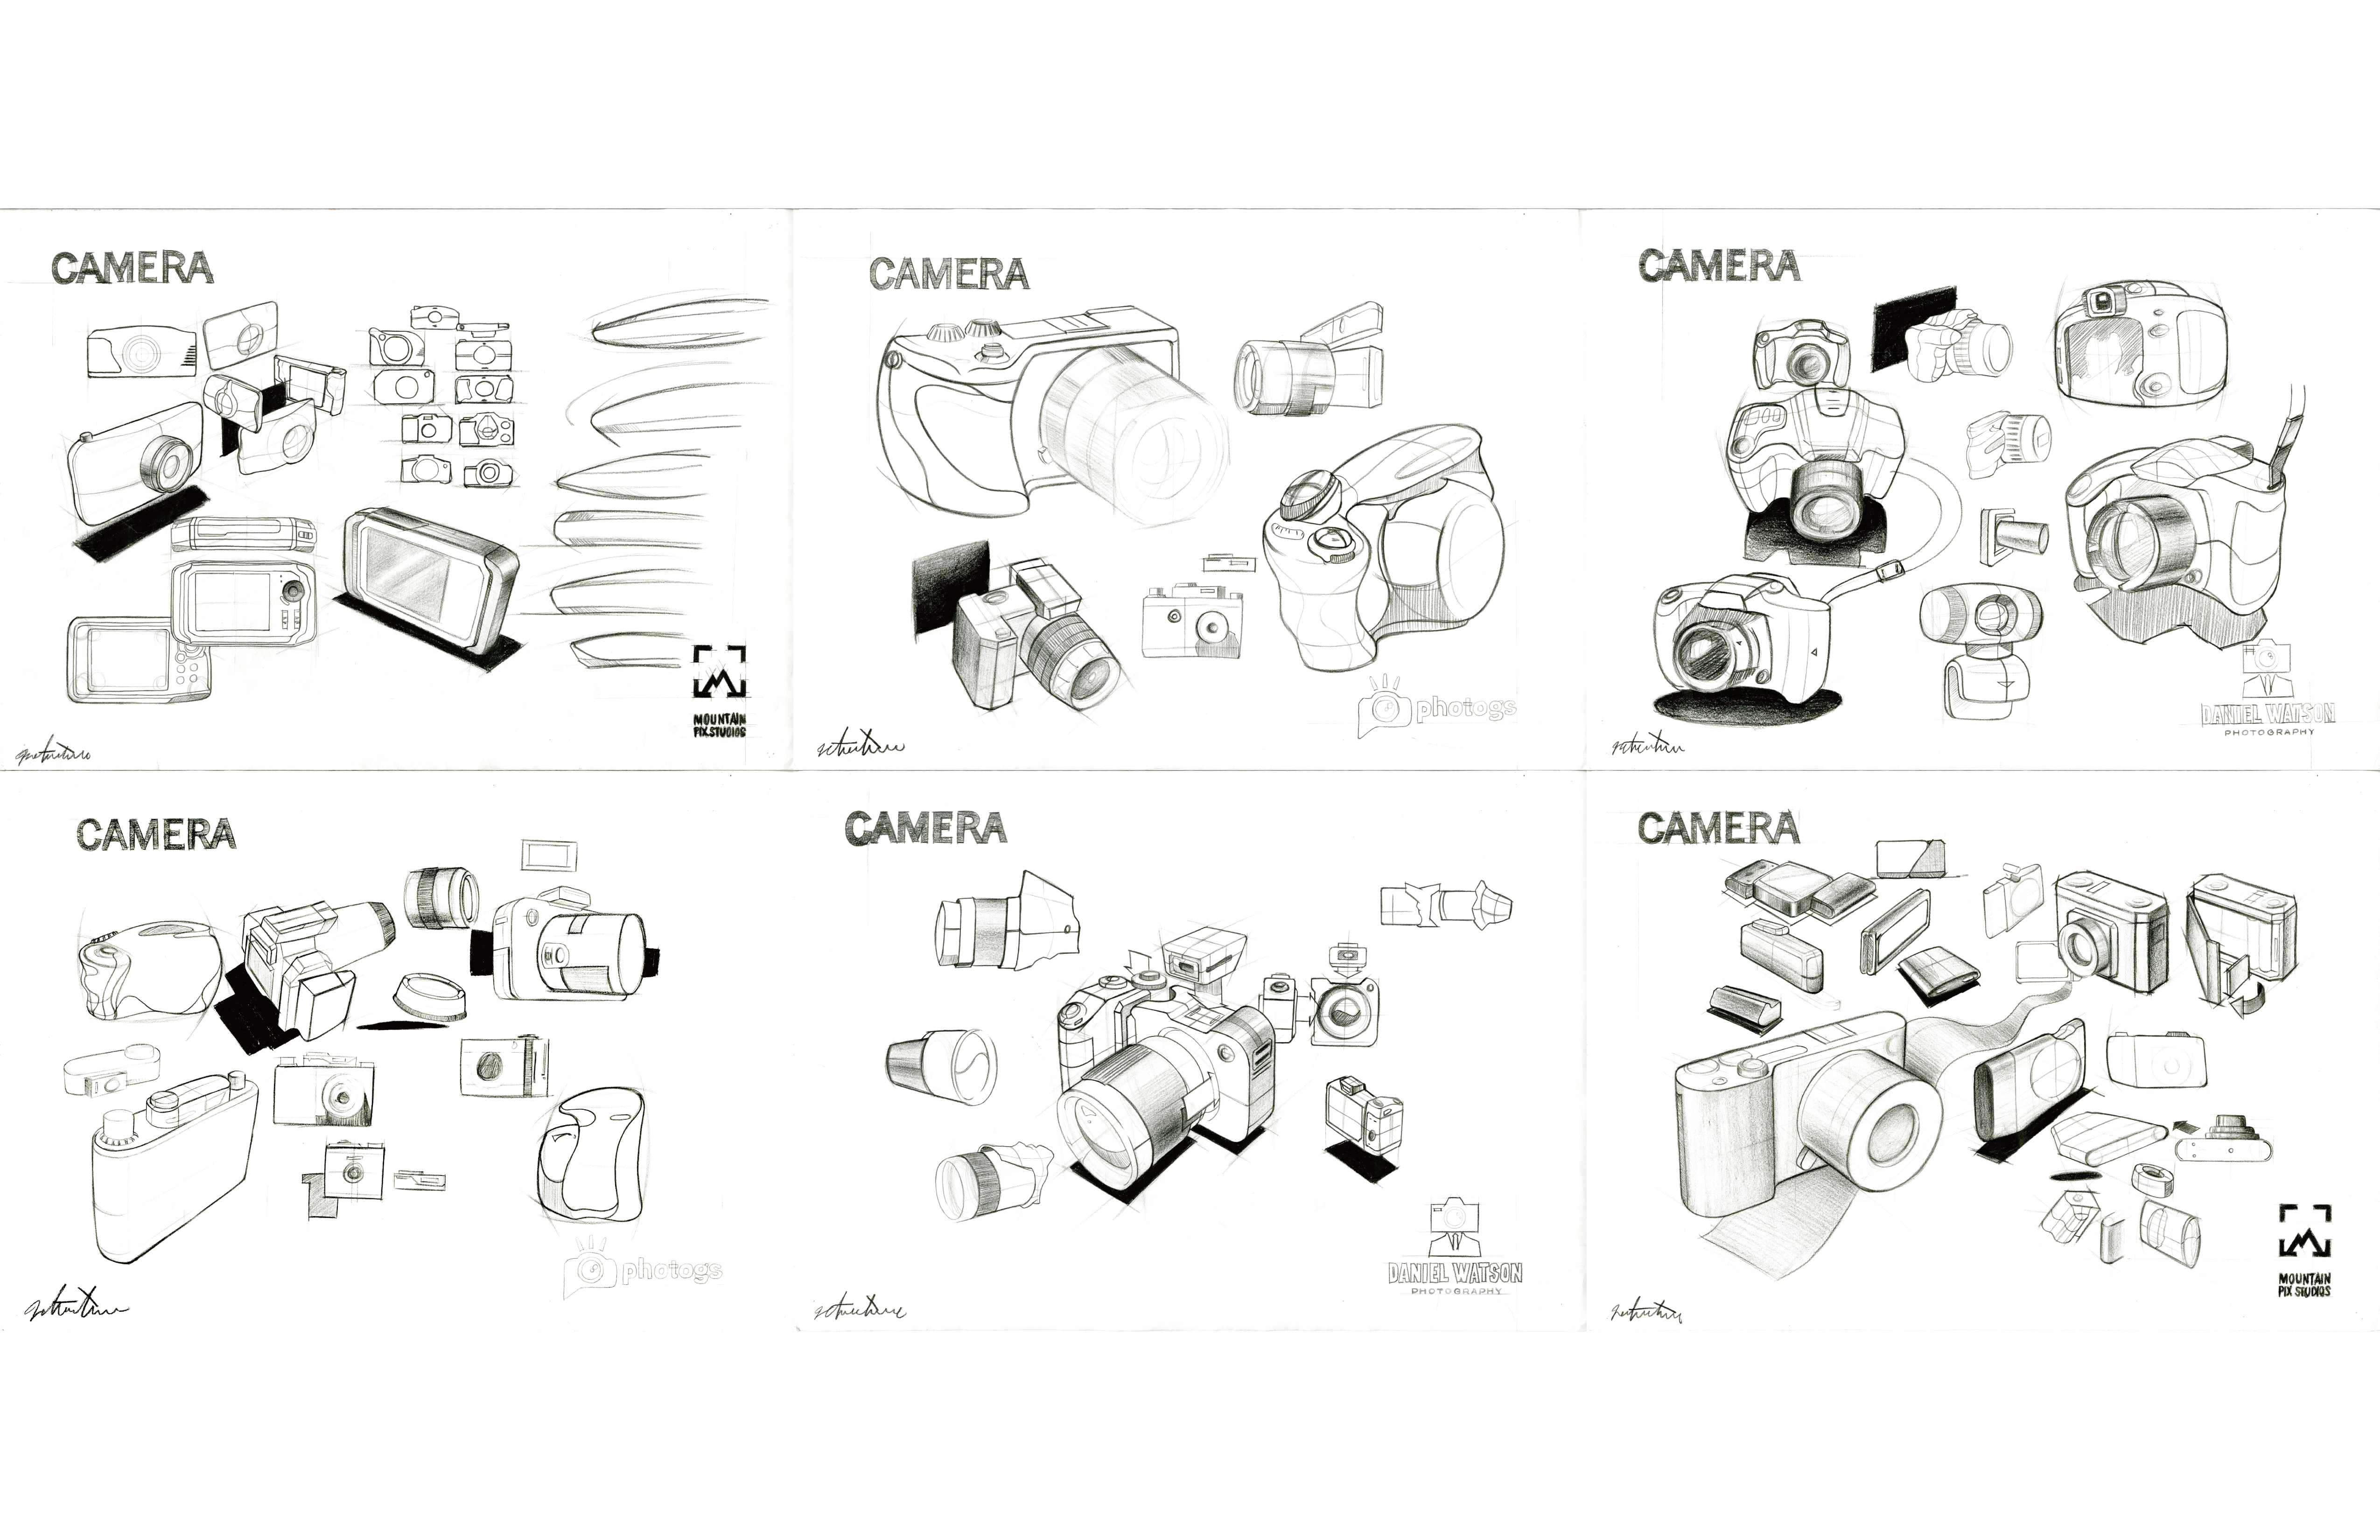 Camera - Case Study